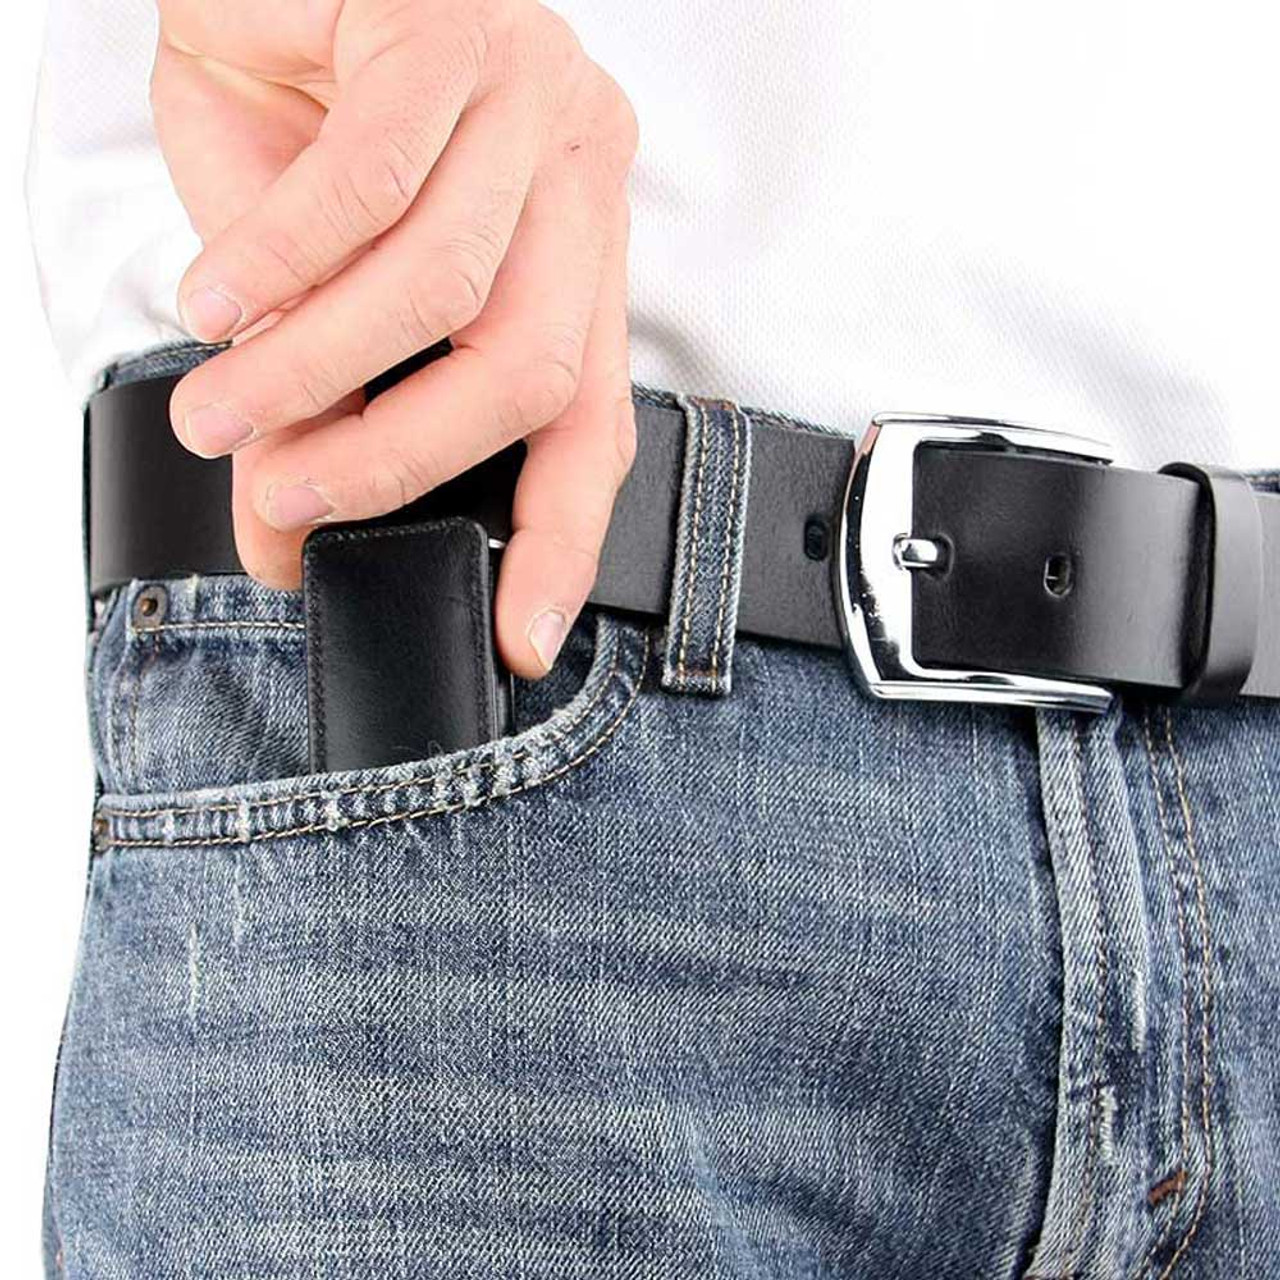 Magazine Pocket Protectors